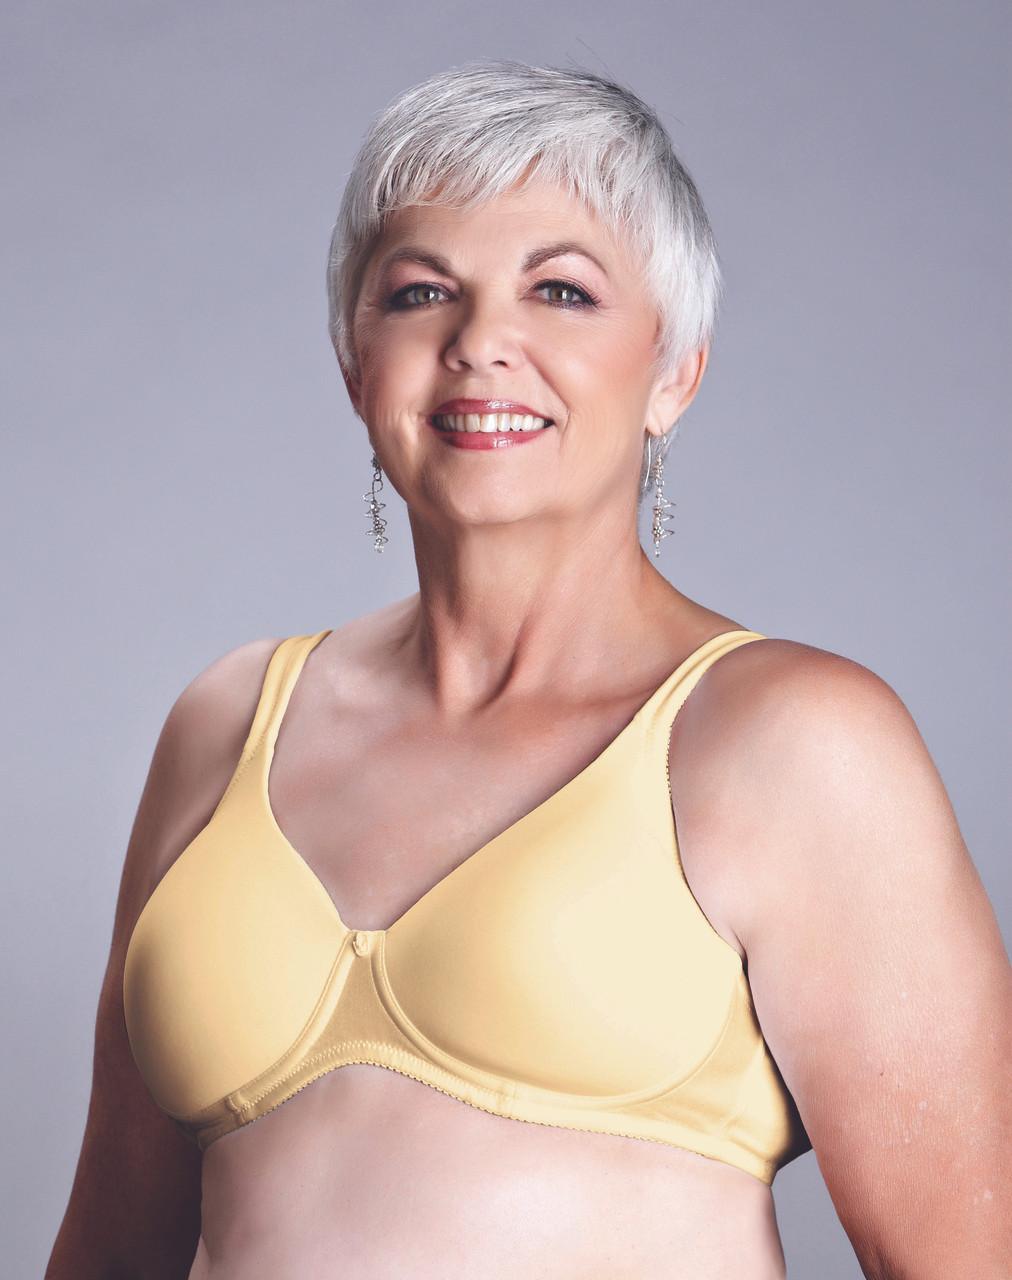 c64362cfc6802 T-Shirt Mastectomy Bra by American Breast Care - Survivor Room